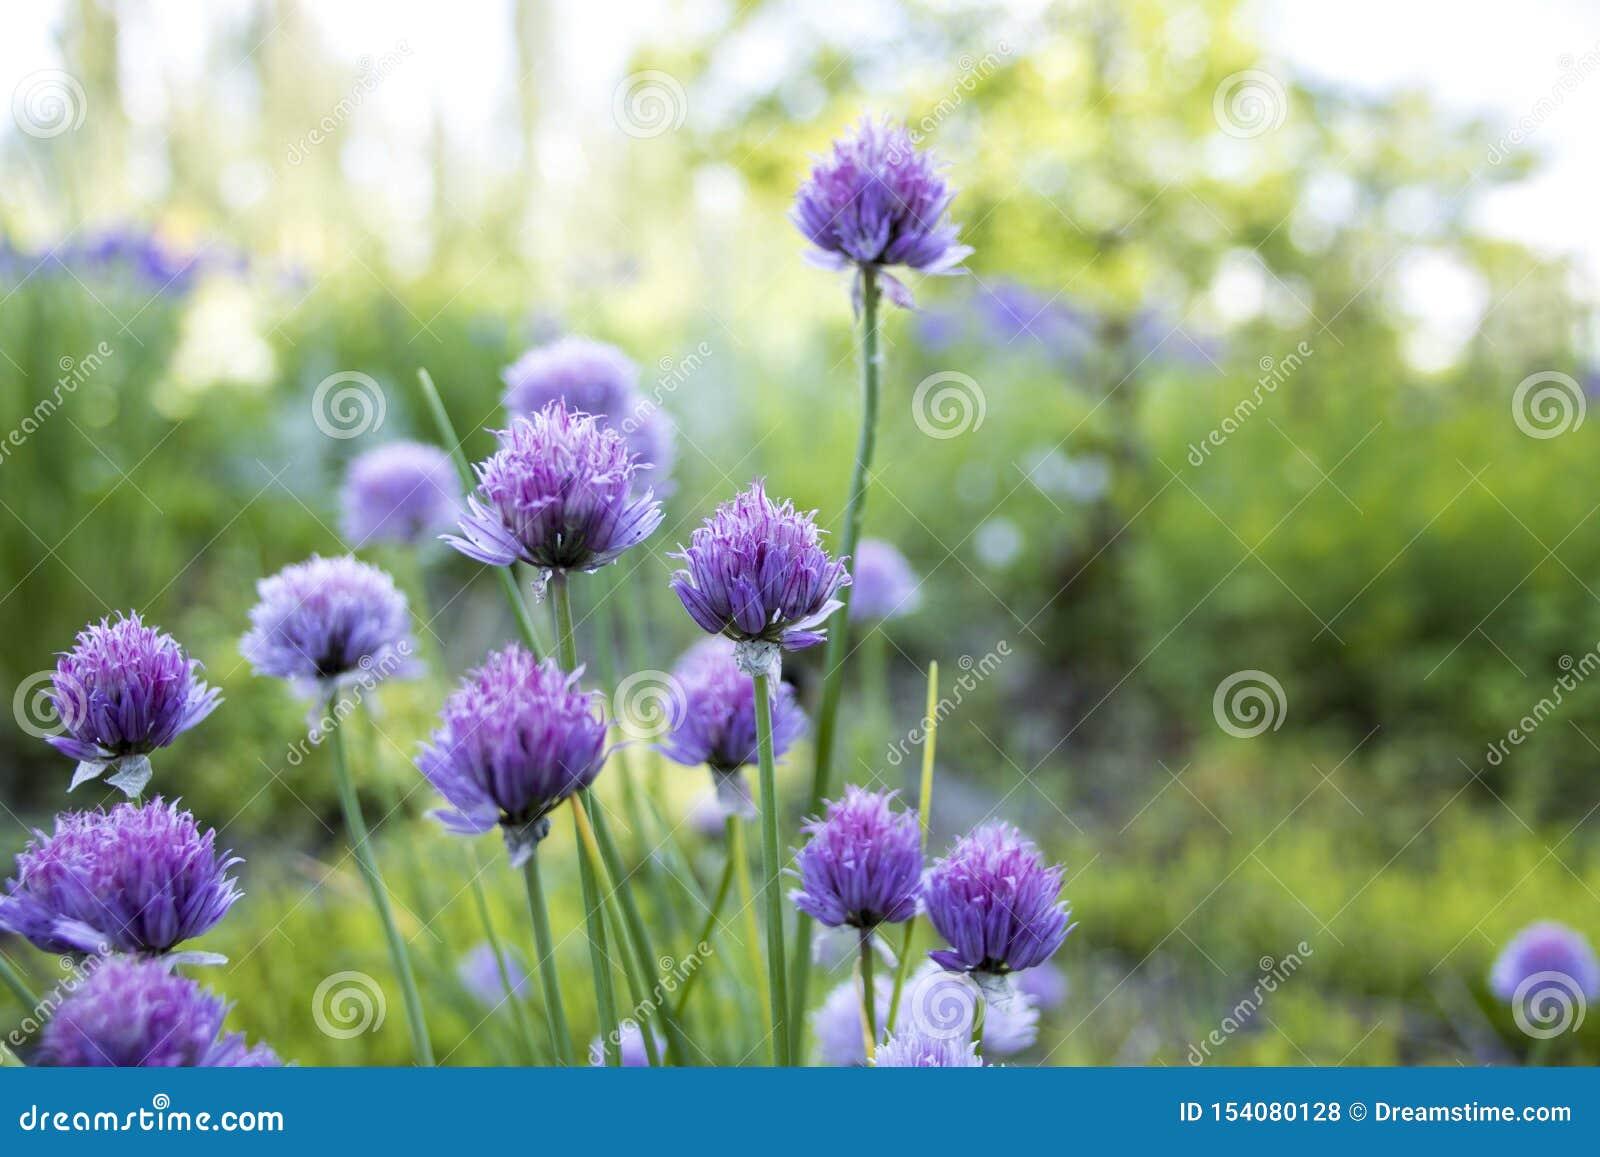 Пурпурное цветение Chives летом